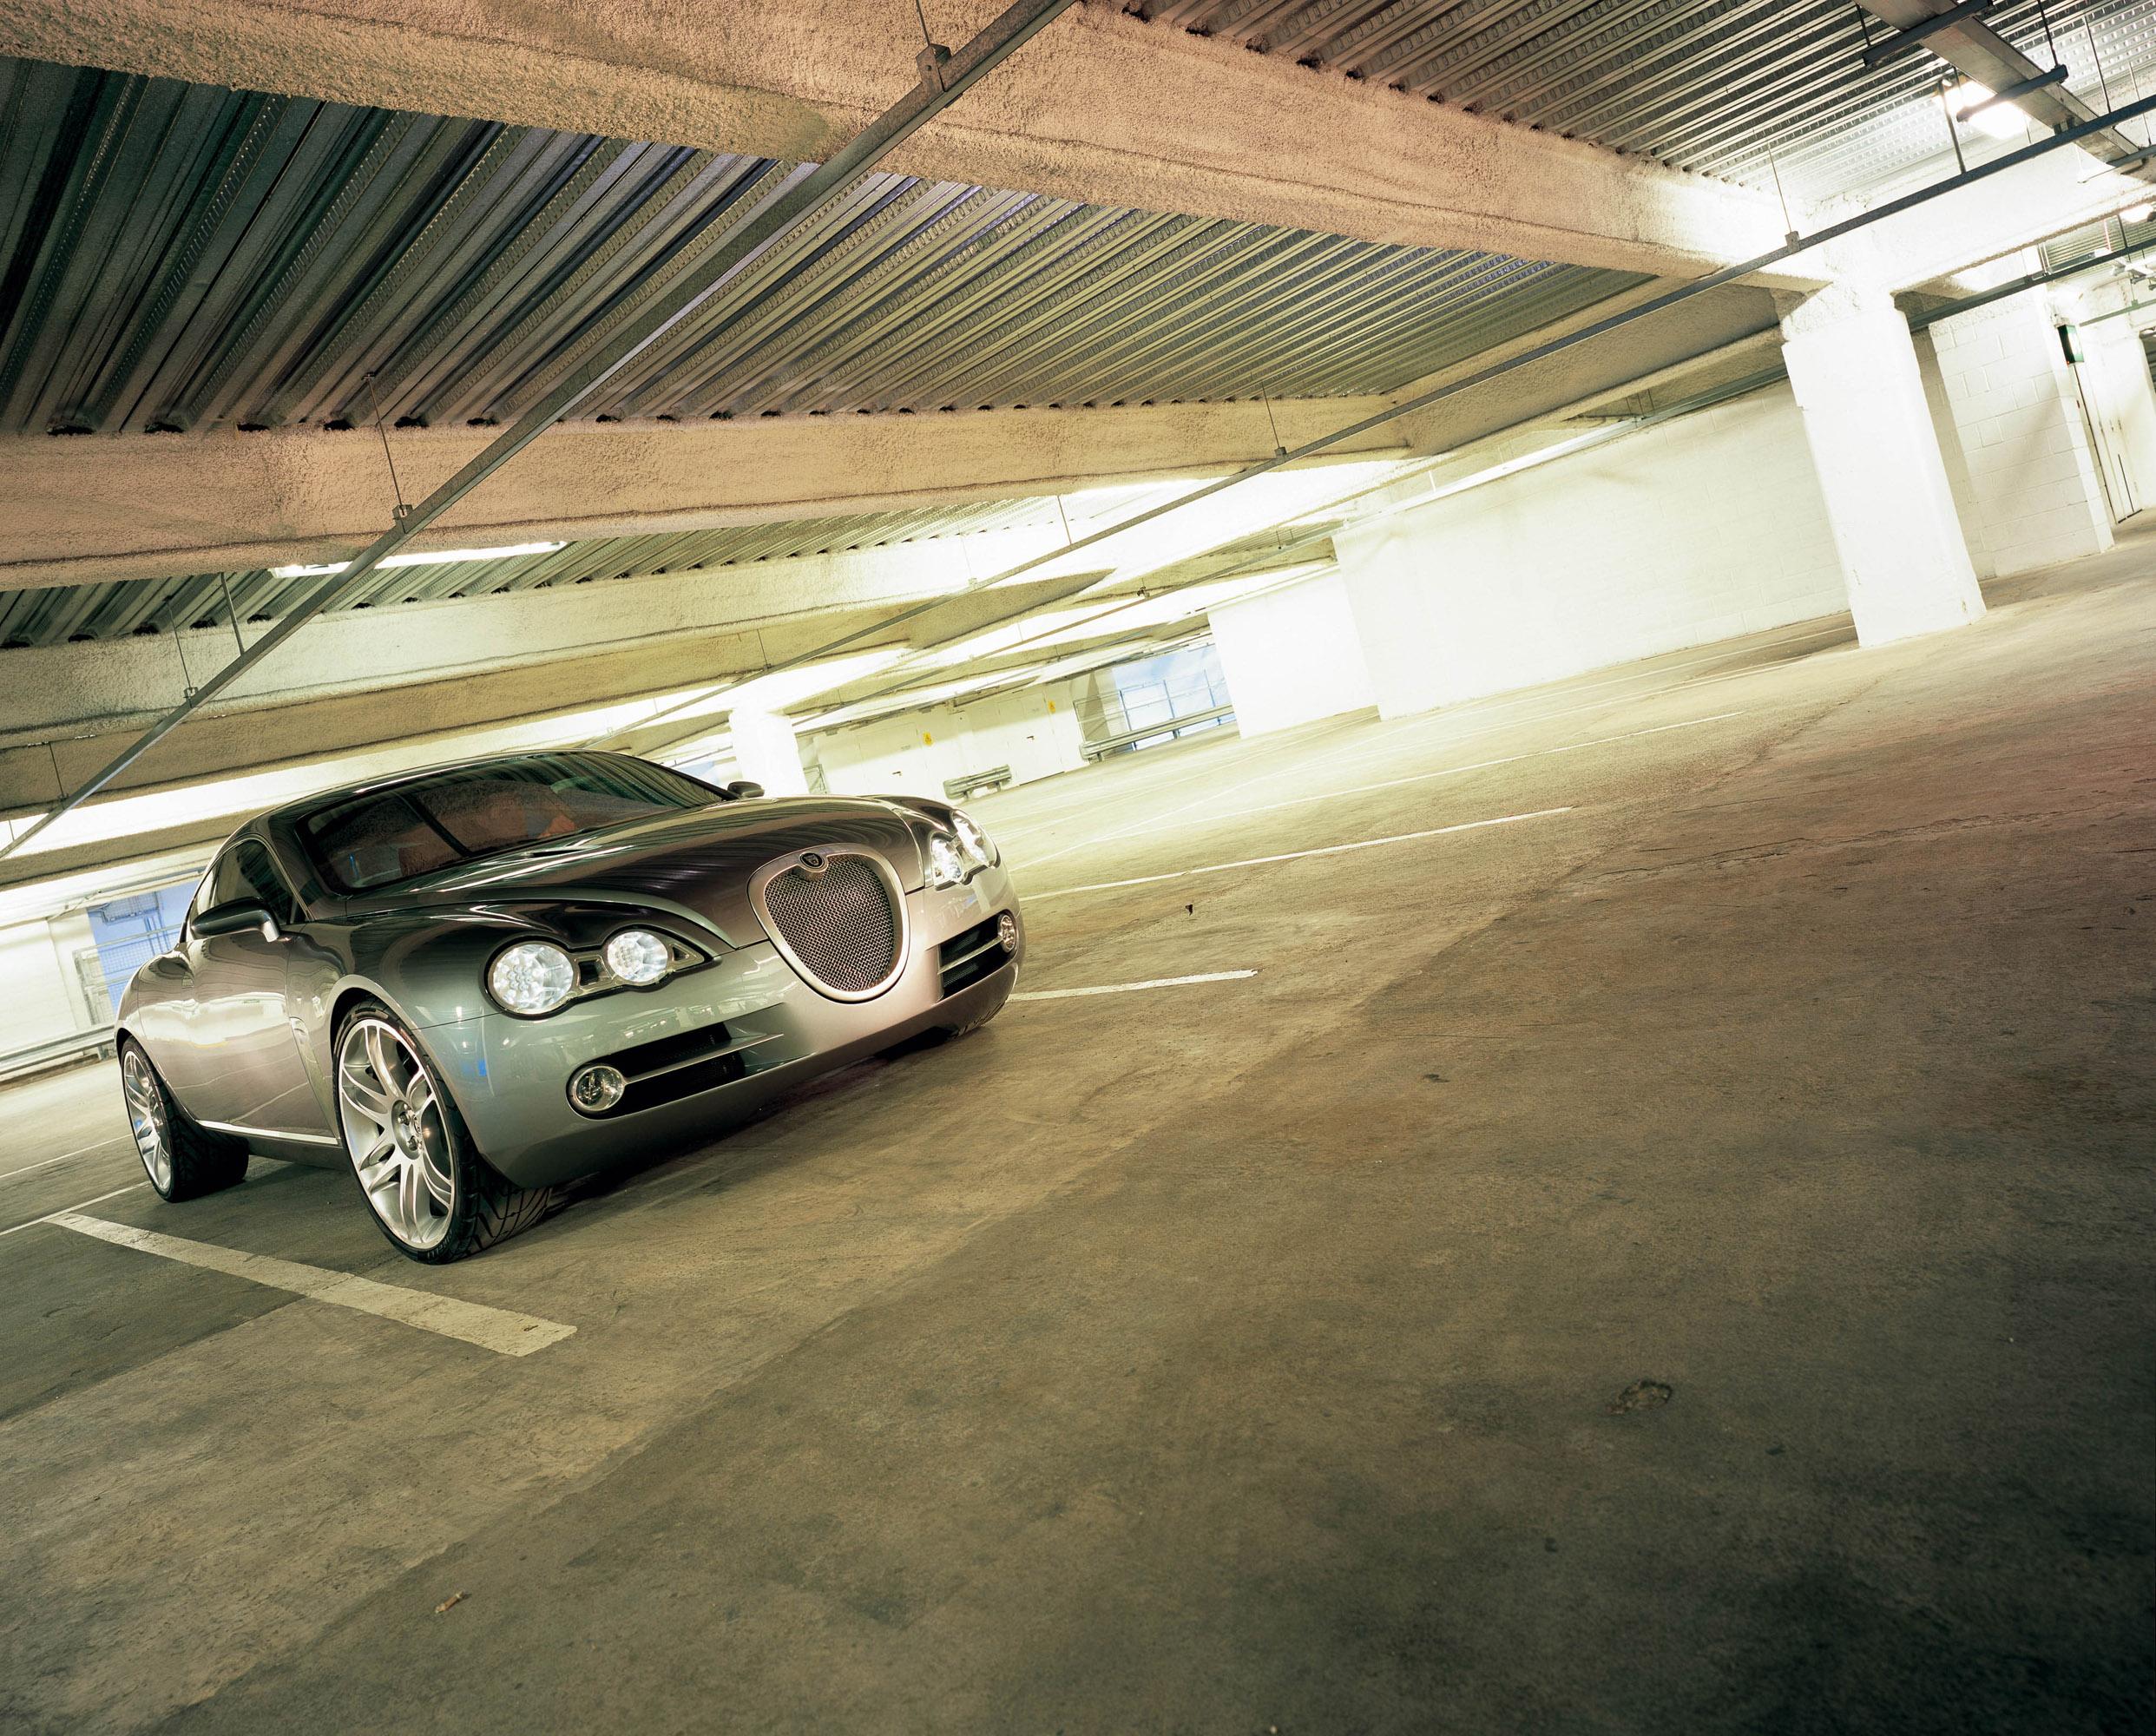 2019 Acura MDX Sport Hybrid hits showrooms